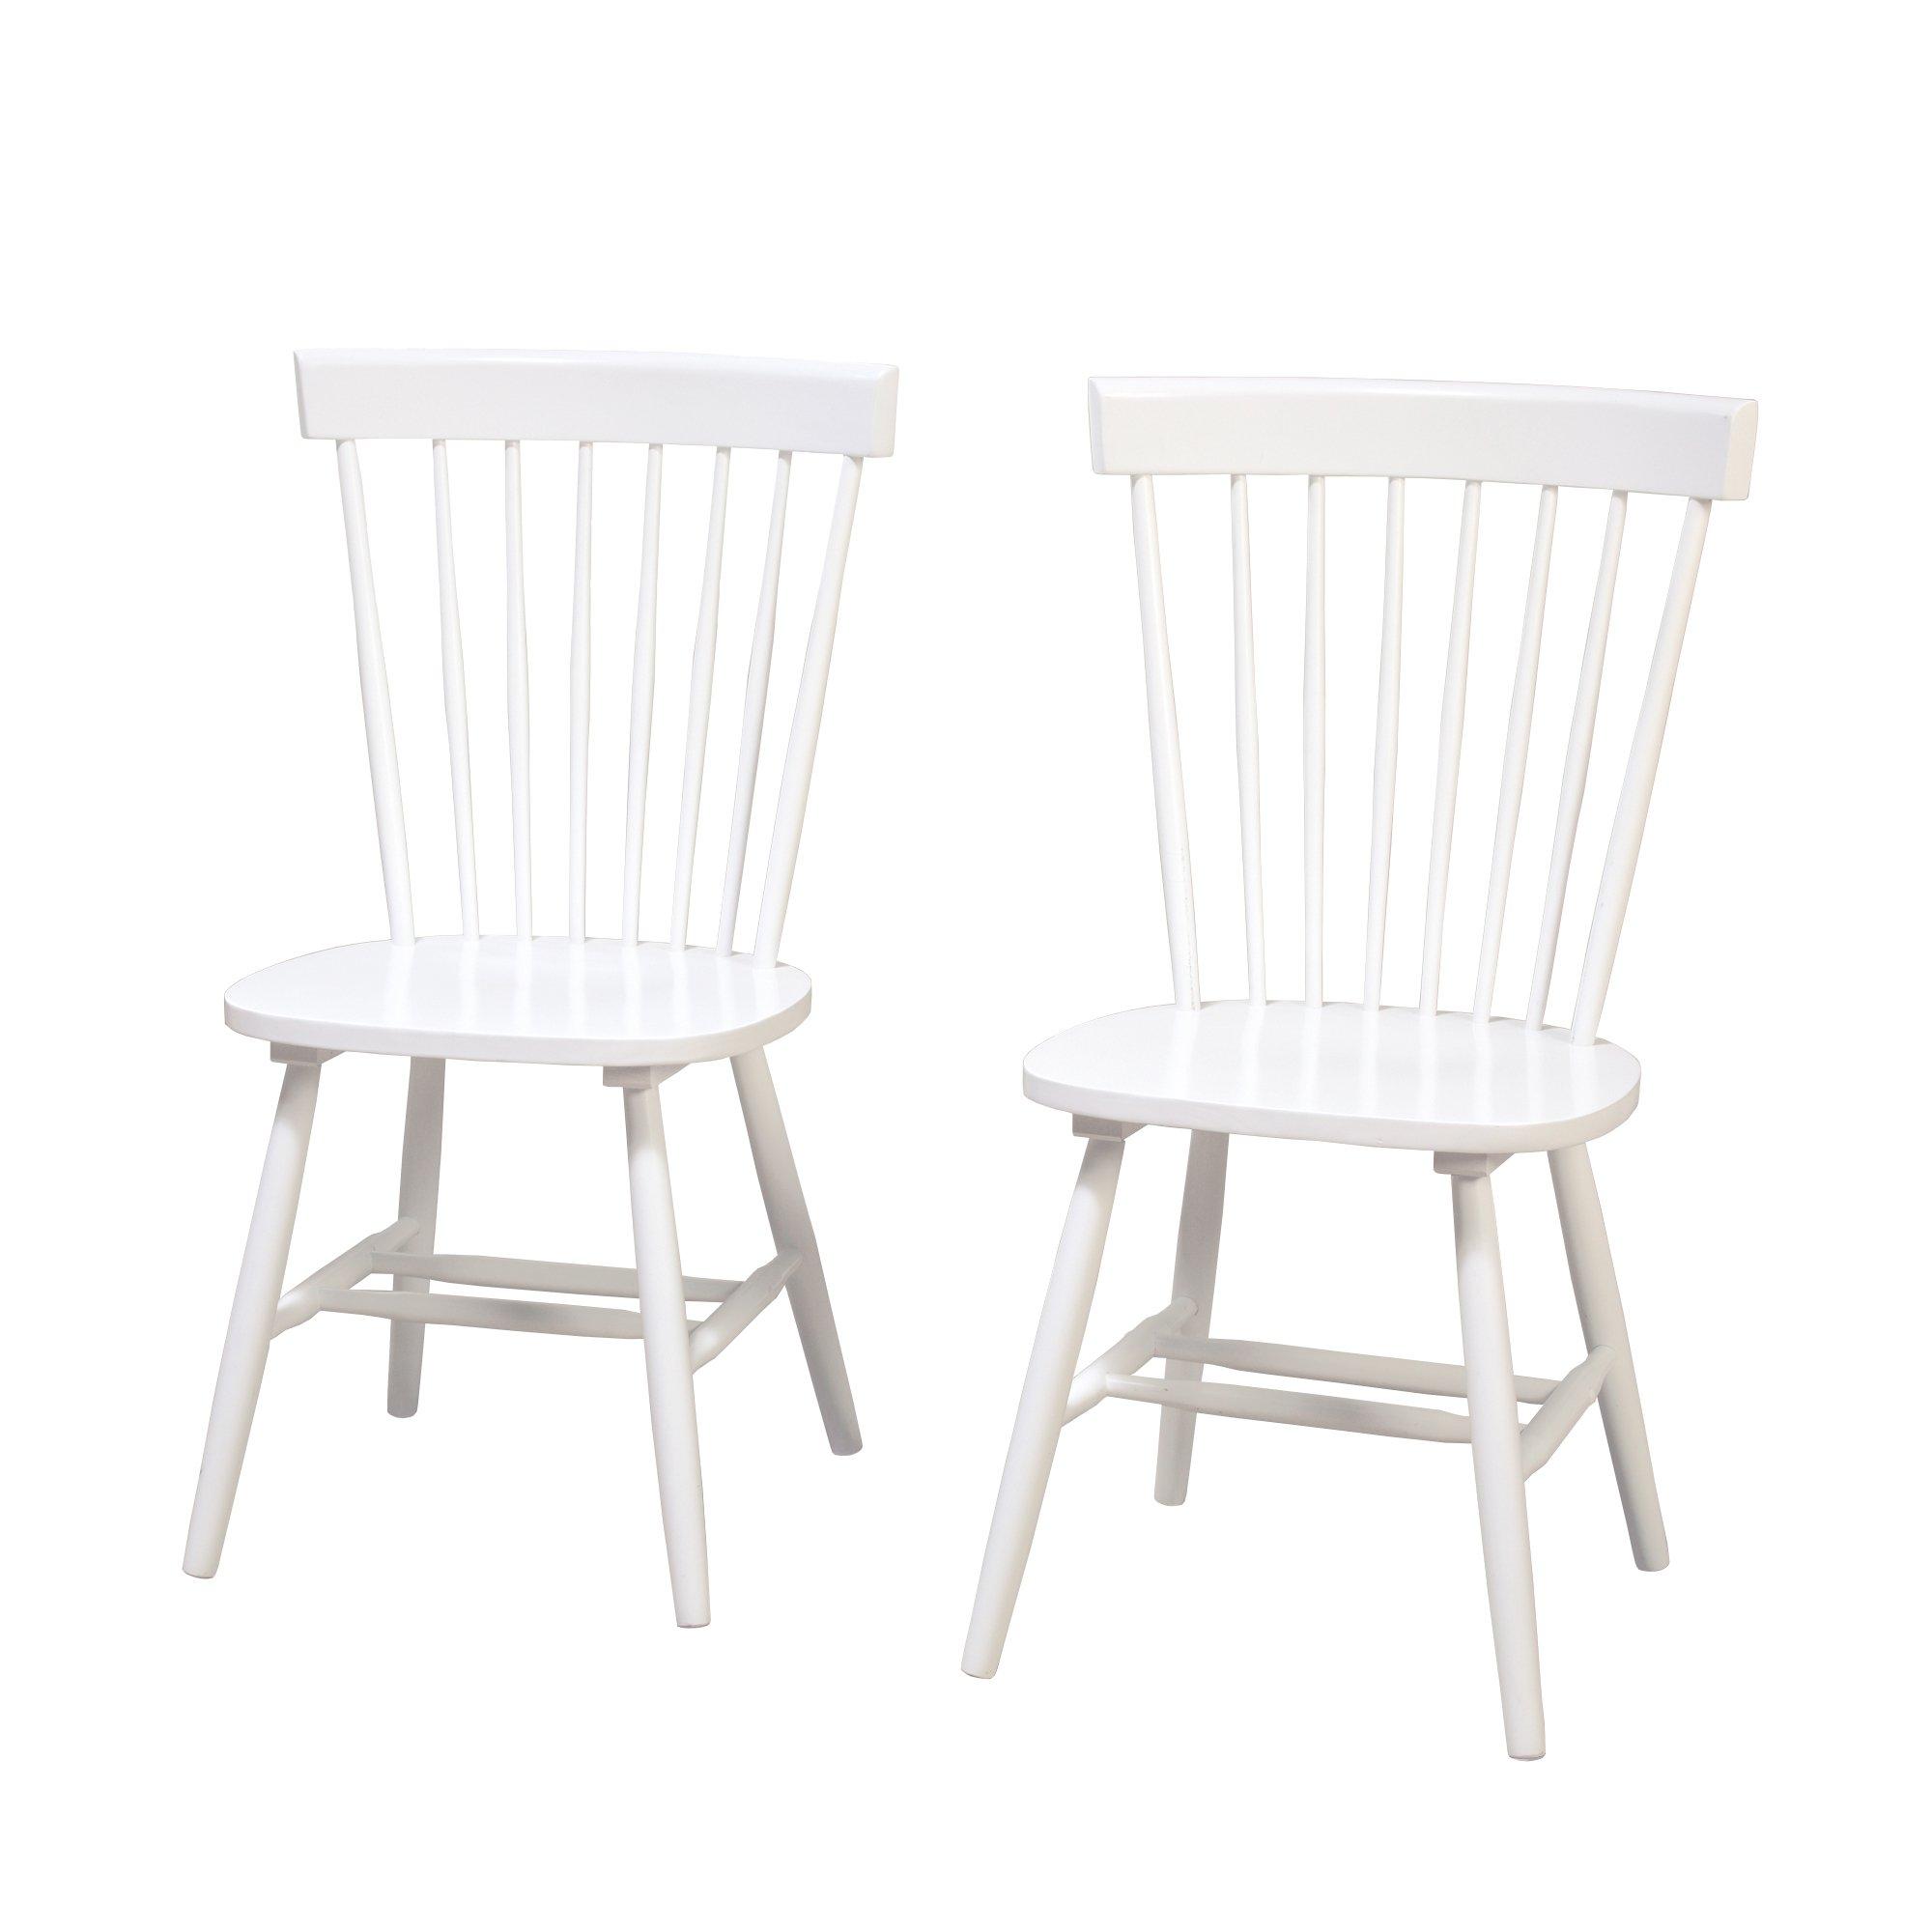 Target Marketing Systems 64918WHT PR Venice Set of 2 Dining Chairs, White by Target Marketing Systems